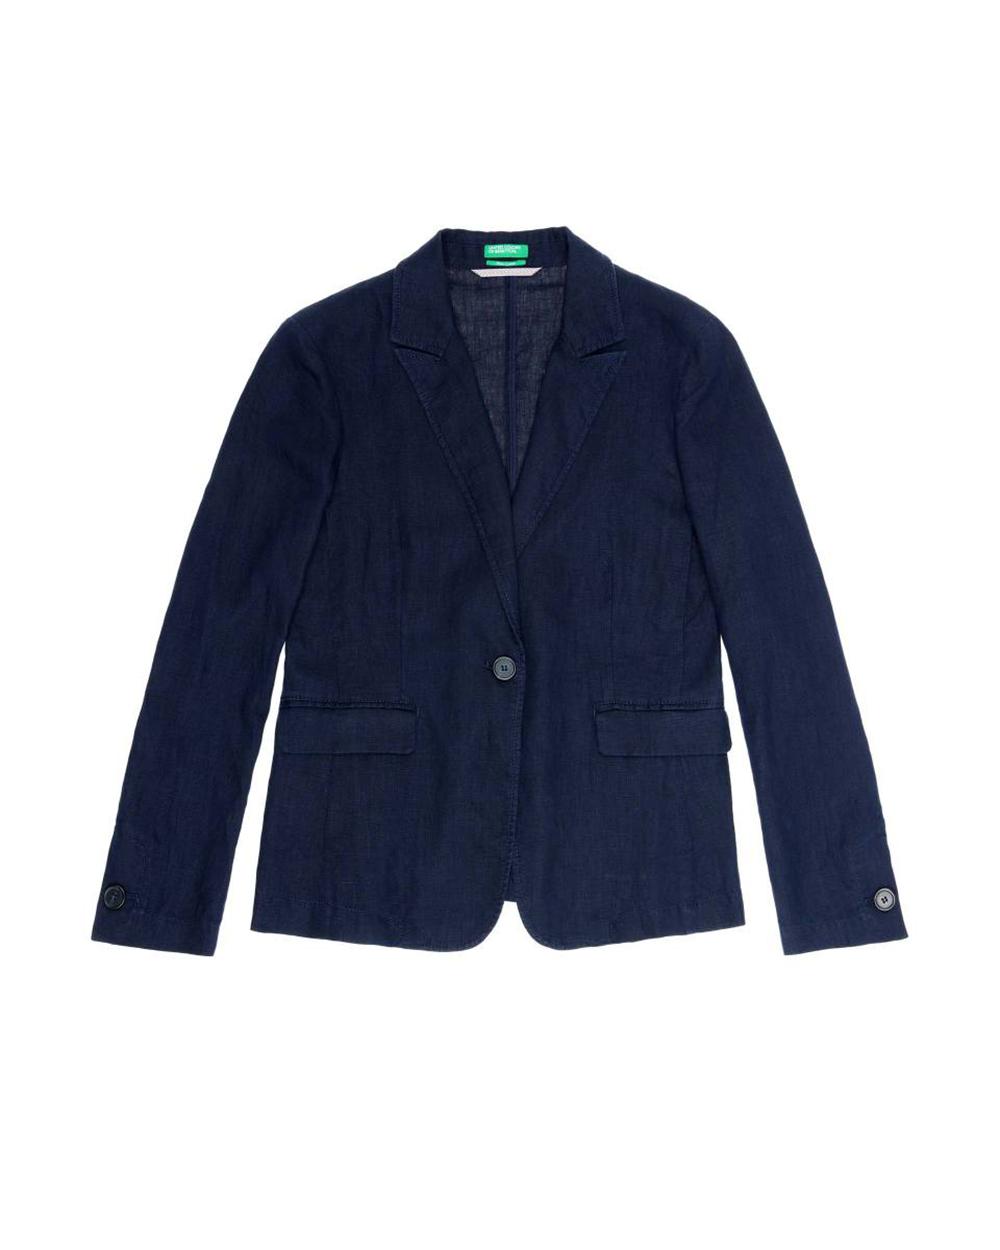 Giacche moda 2019 Benetton Primavera Estate 2019